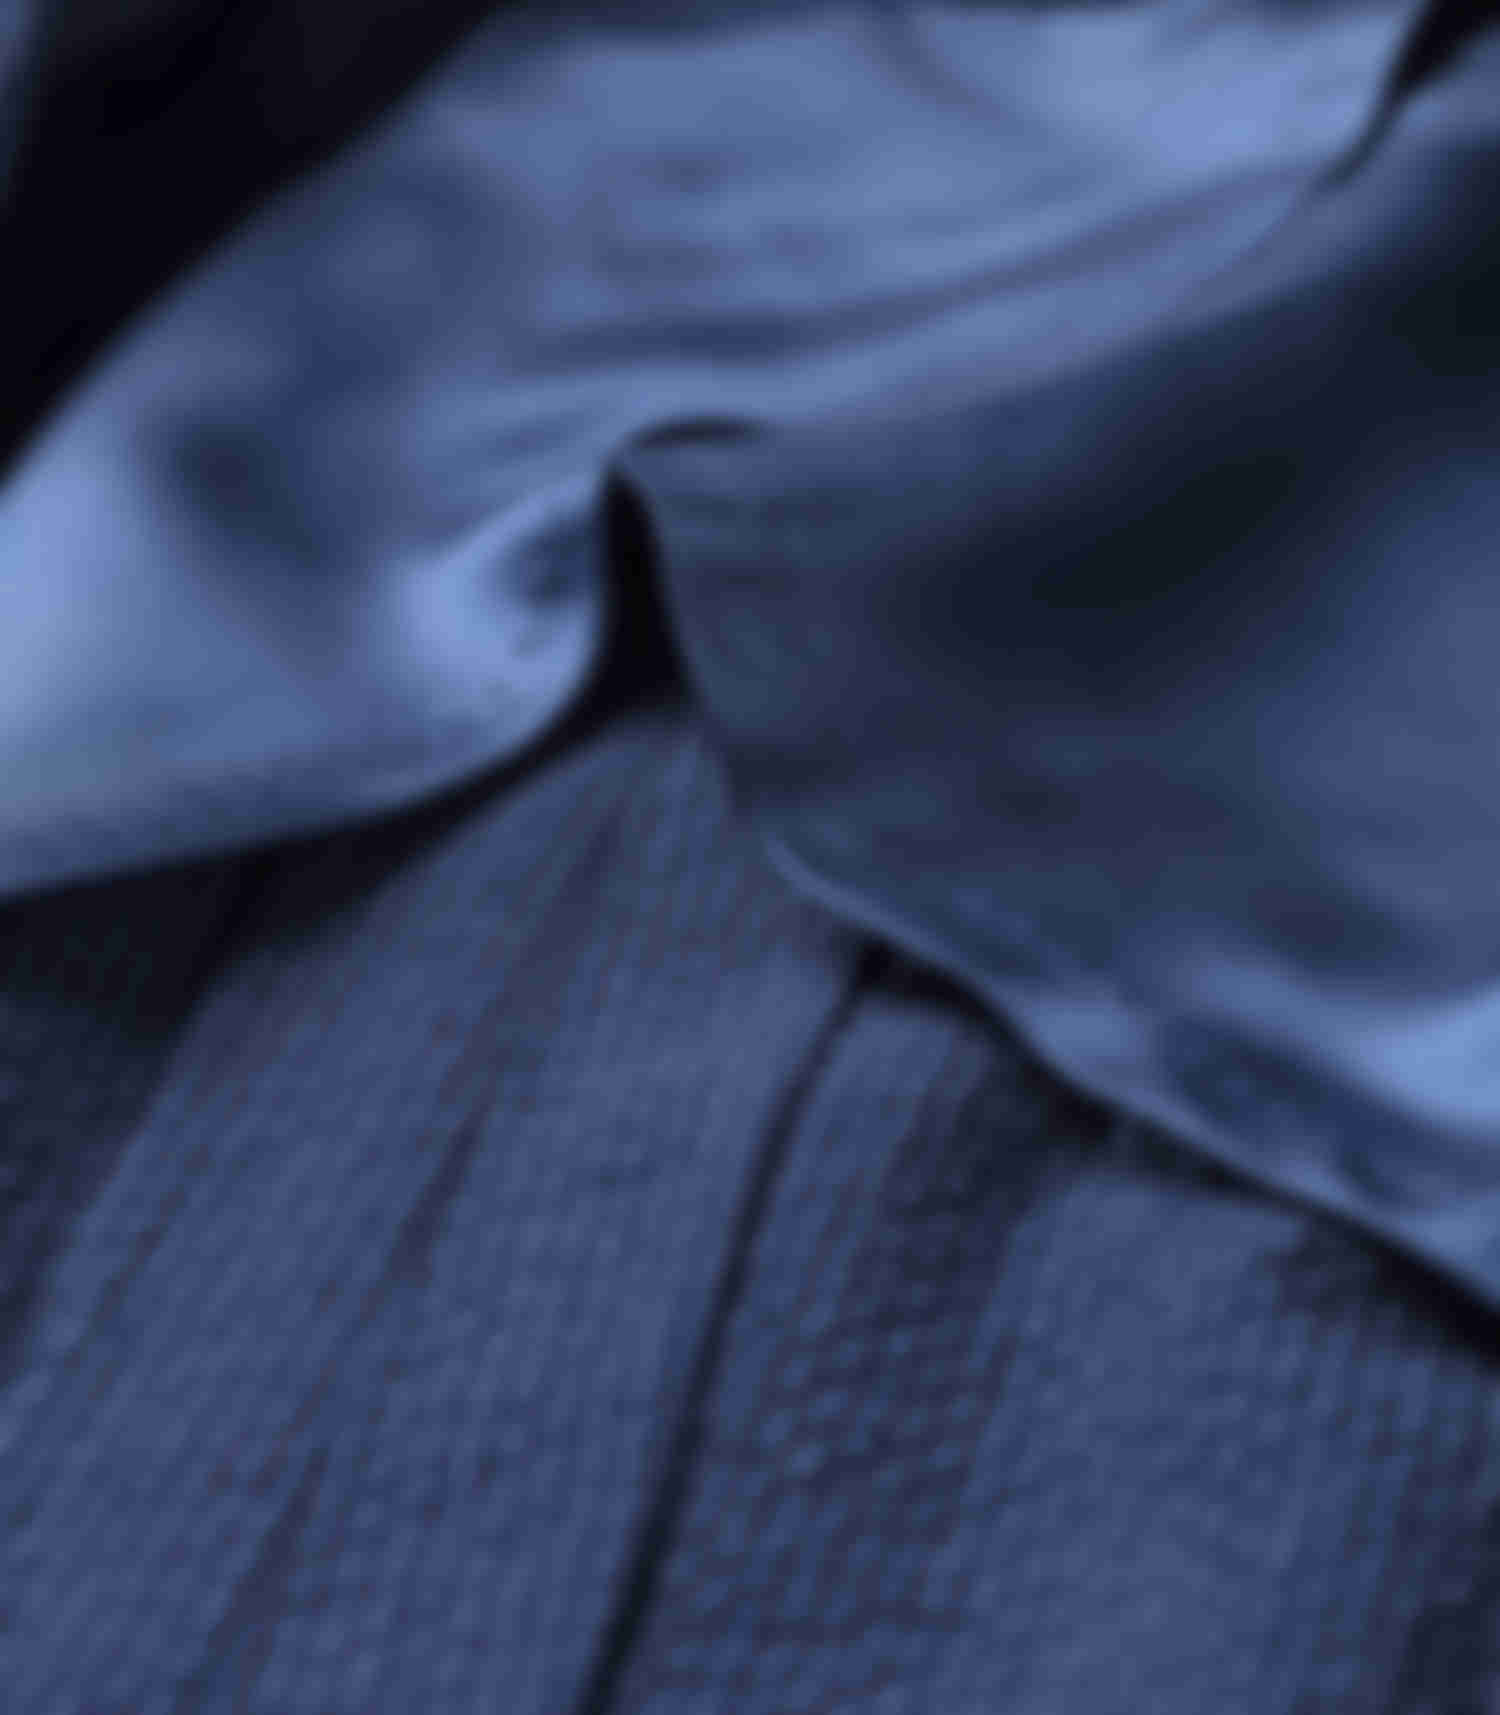 Doublure veste bemberg bleu montée main